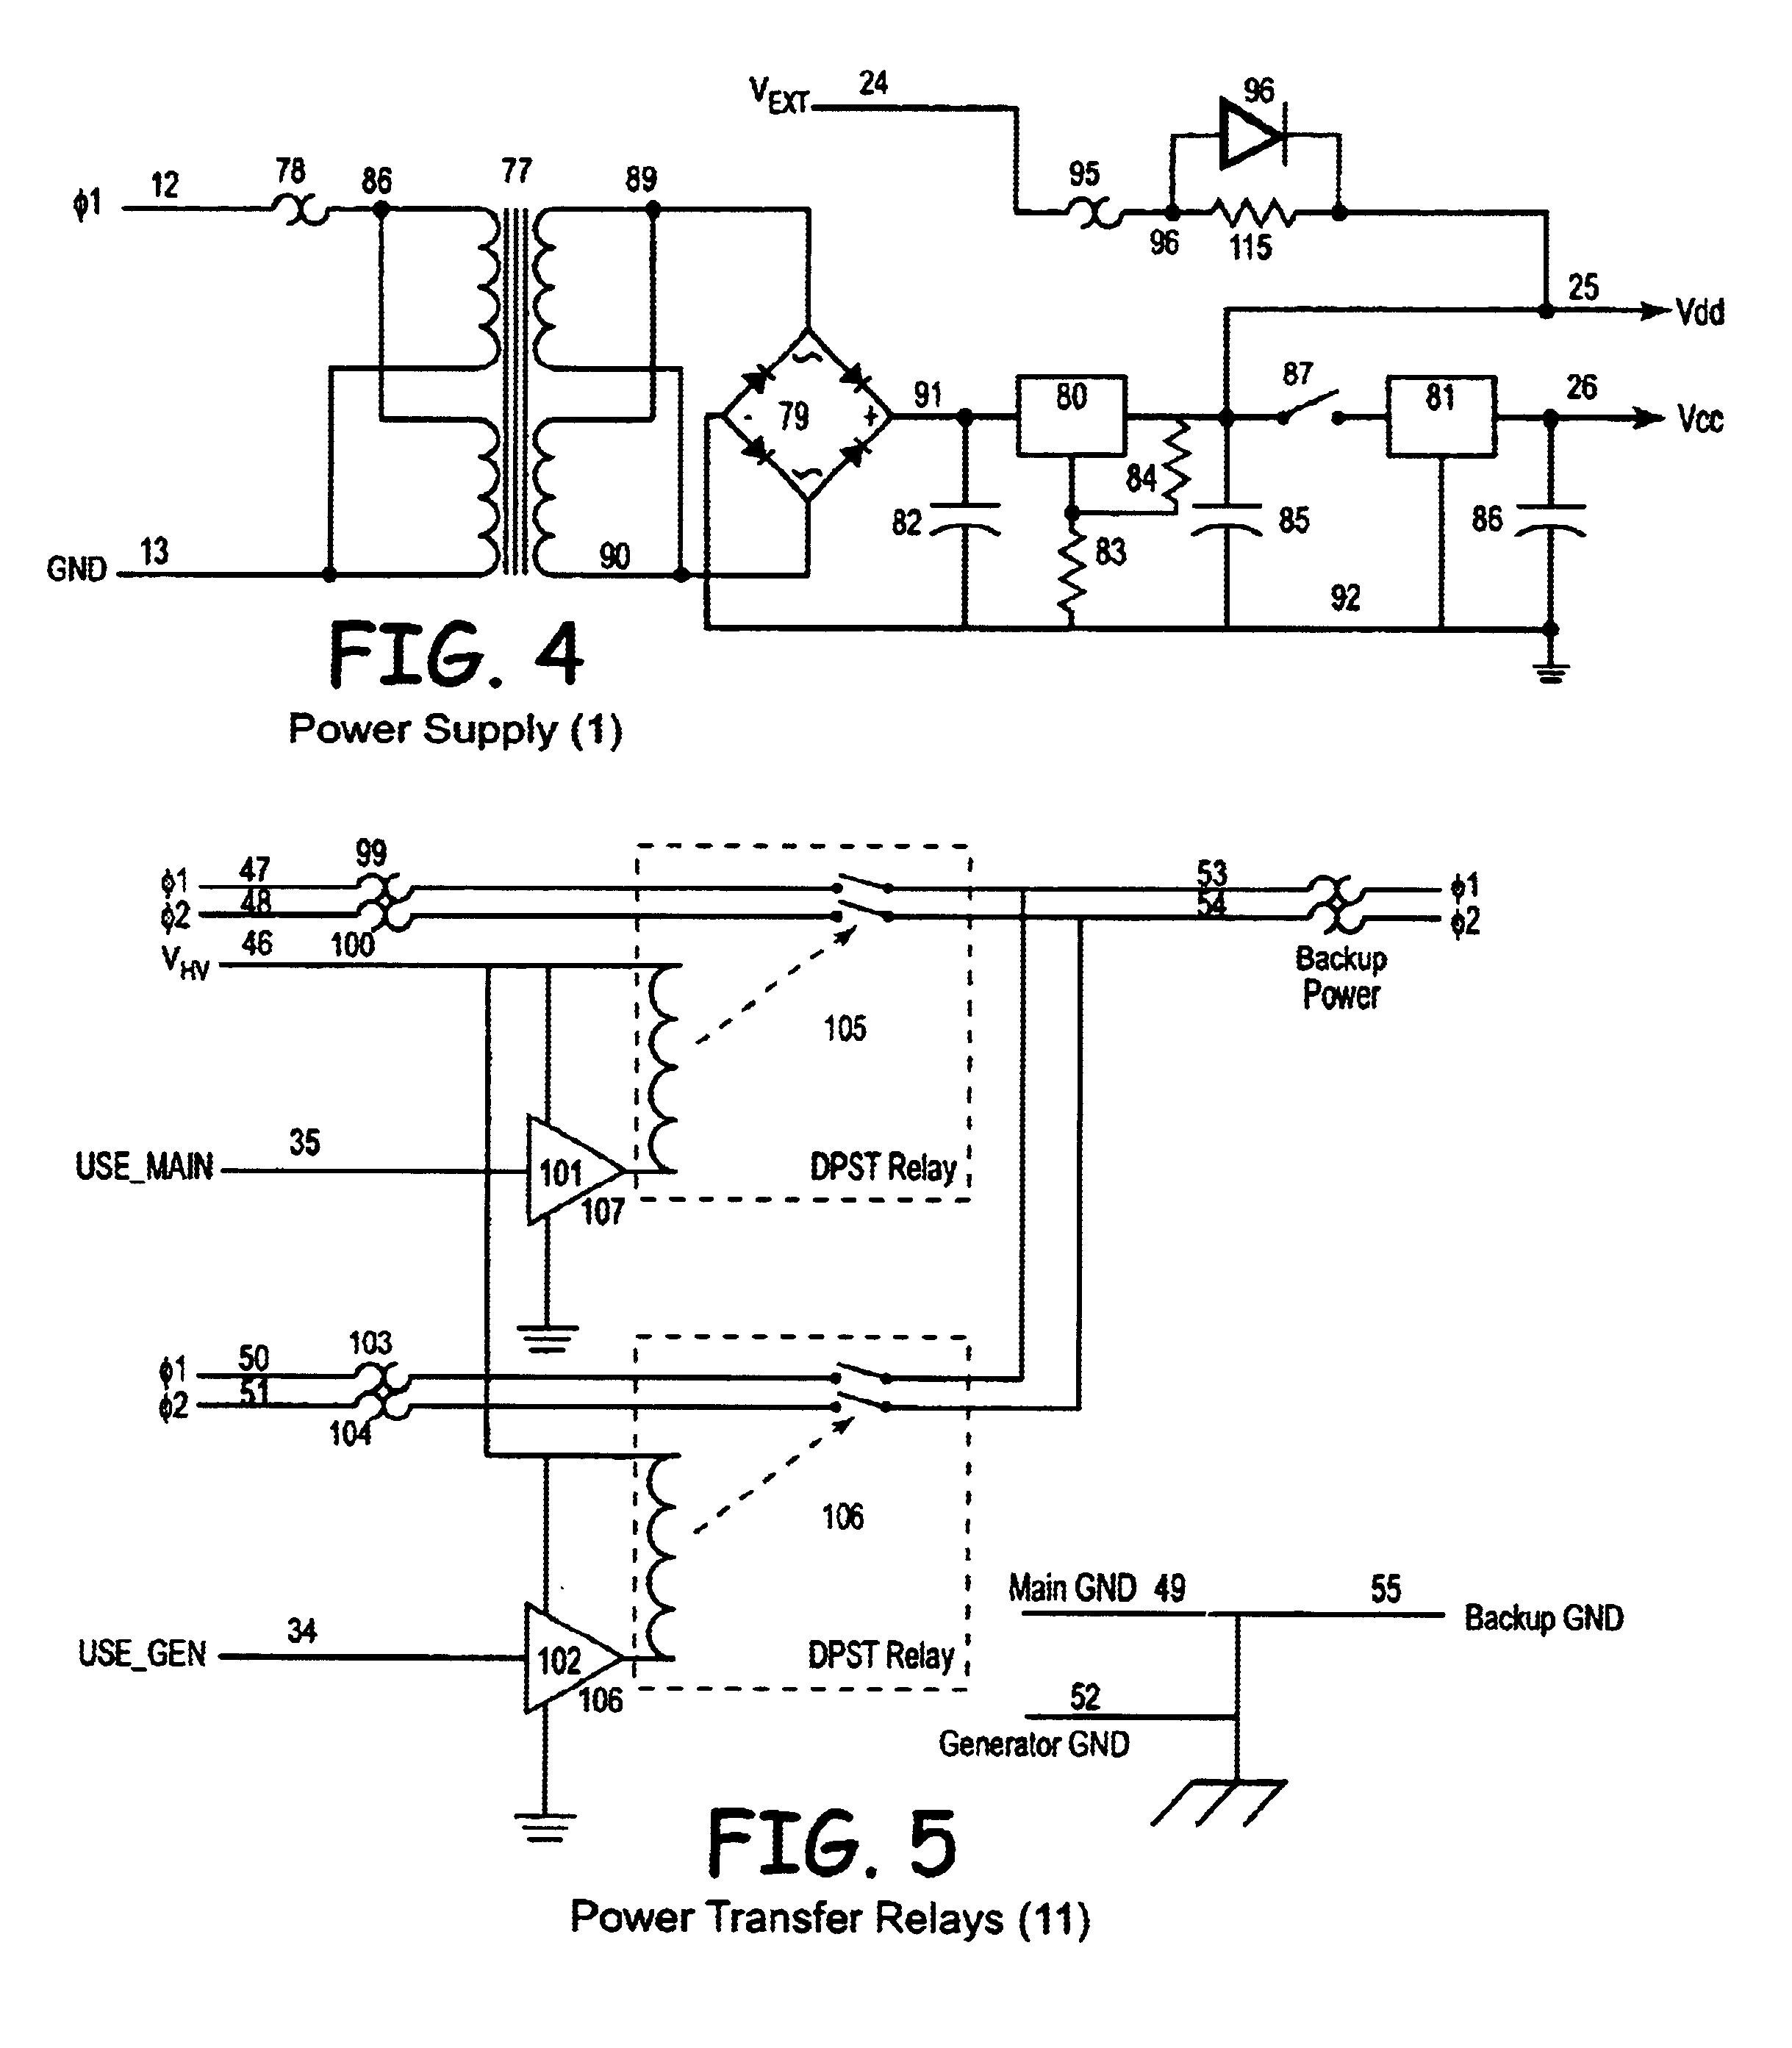 Home Generator Transfer Switch Wiring Diagram Automatic Transfer Switch Wiring Diagram Pdf Best Generac 200 New Of Home Generator Transfer Switch Wiring Diagram